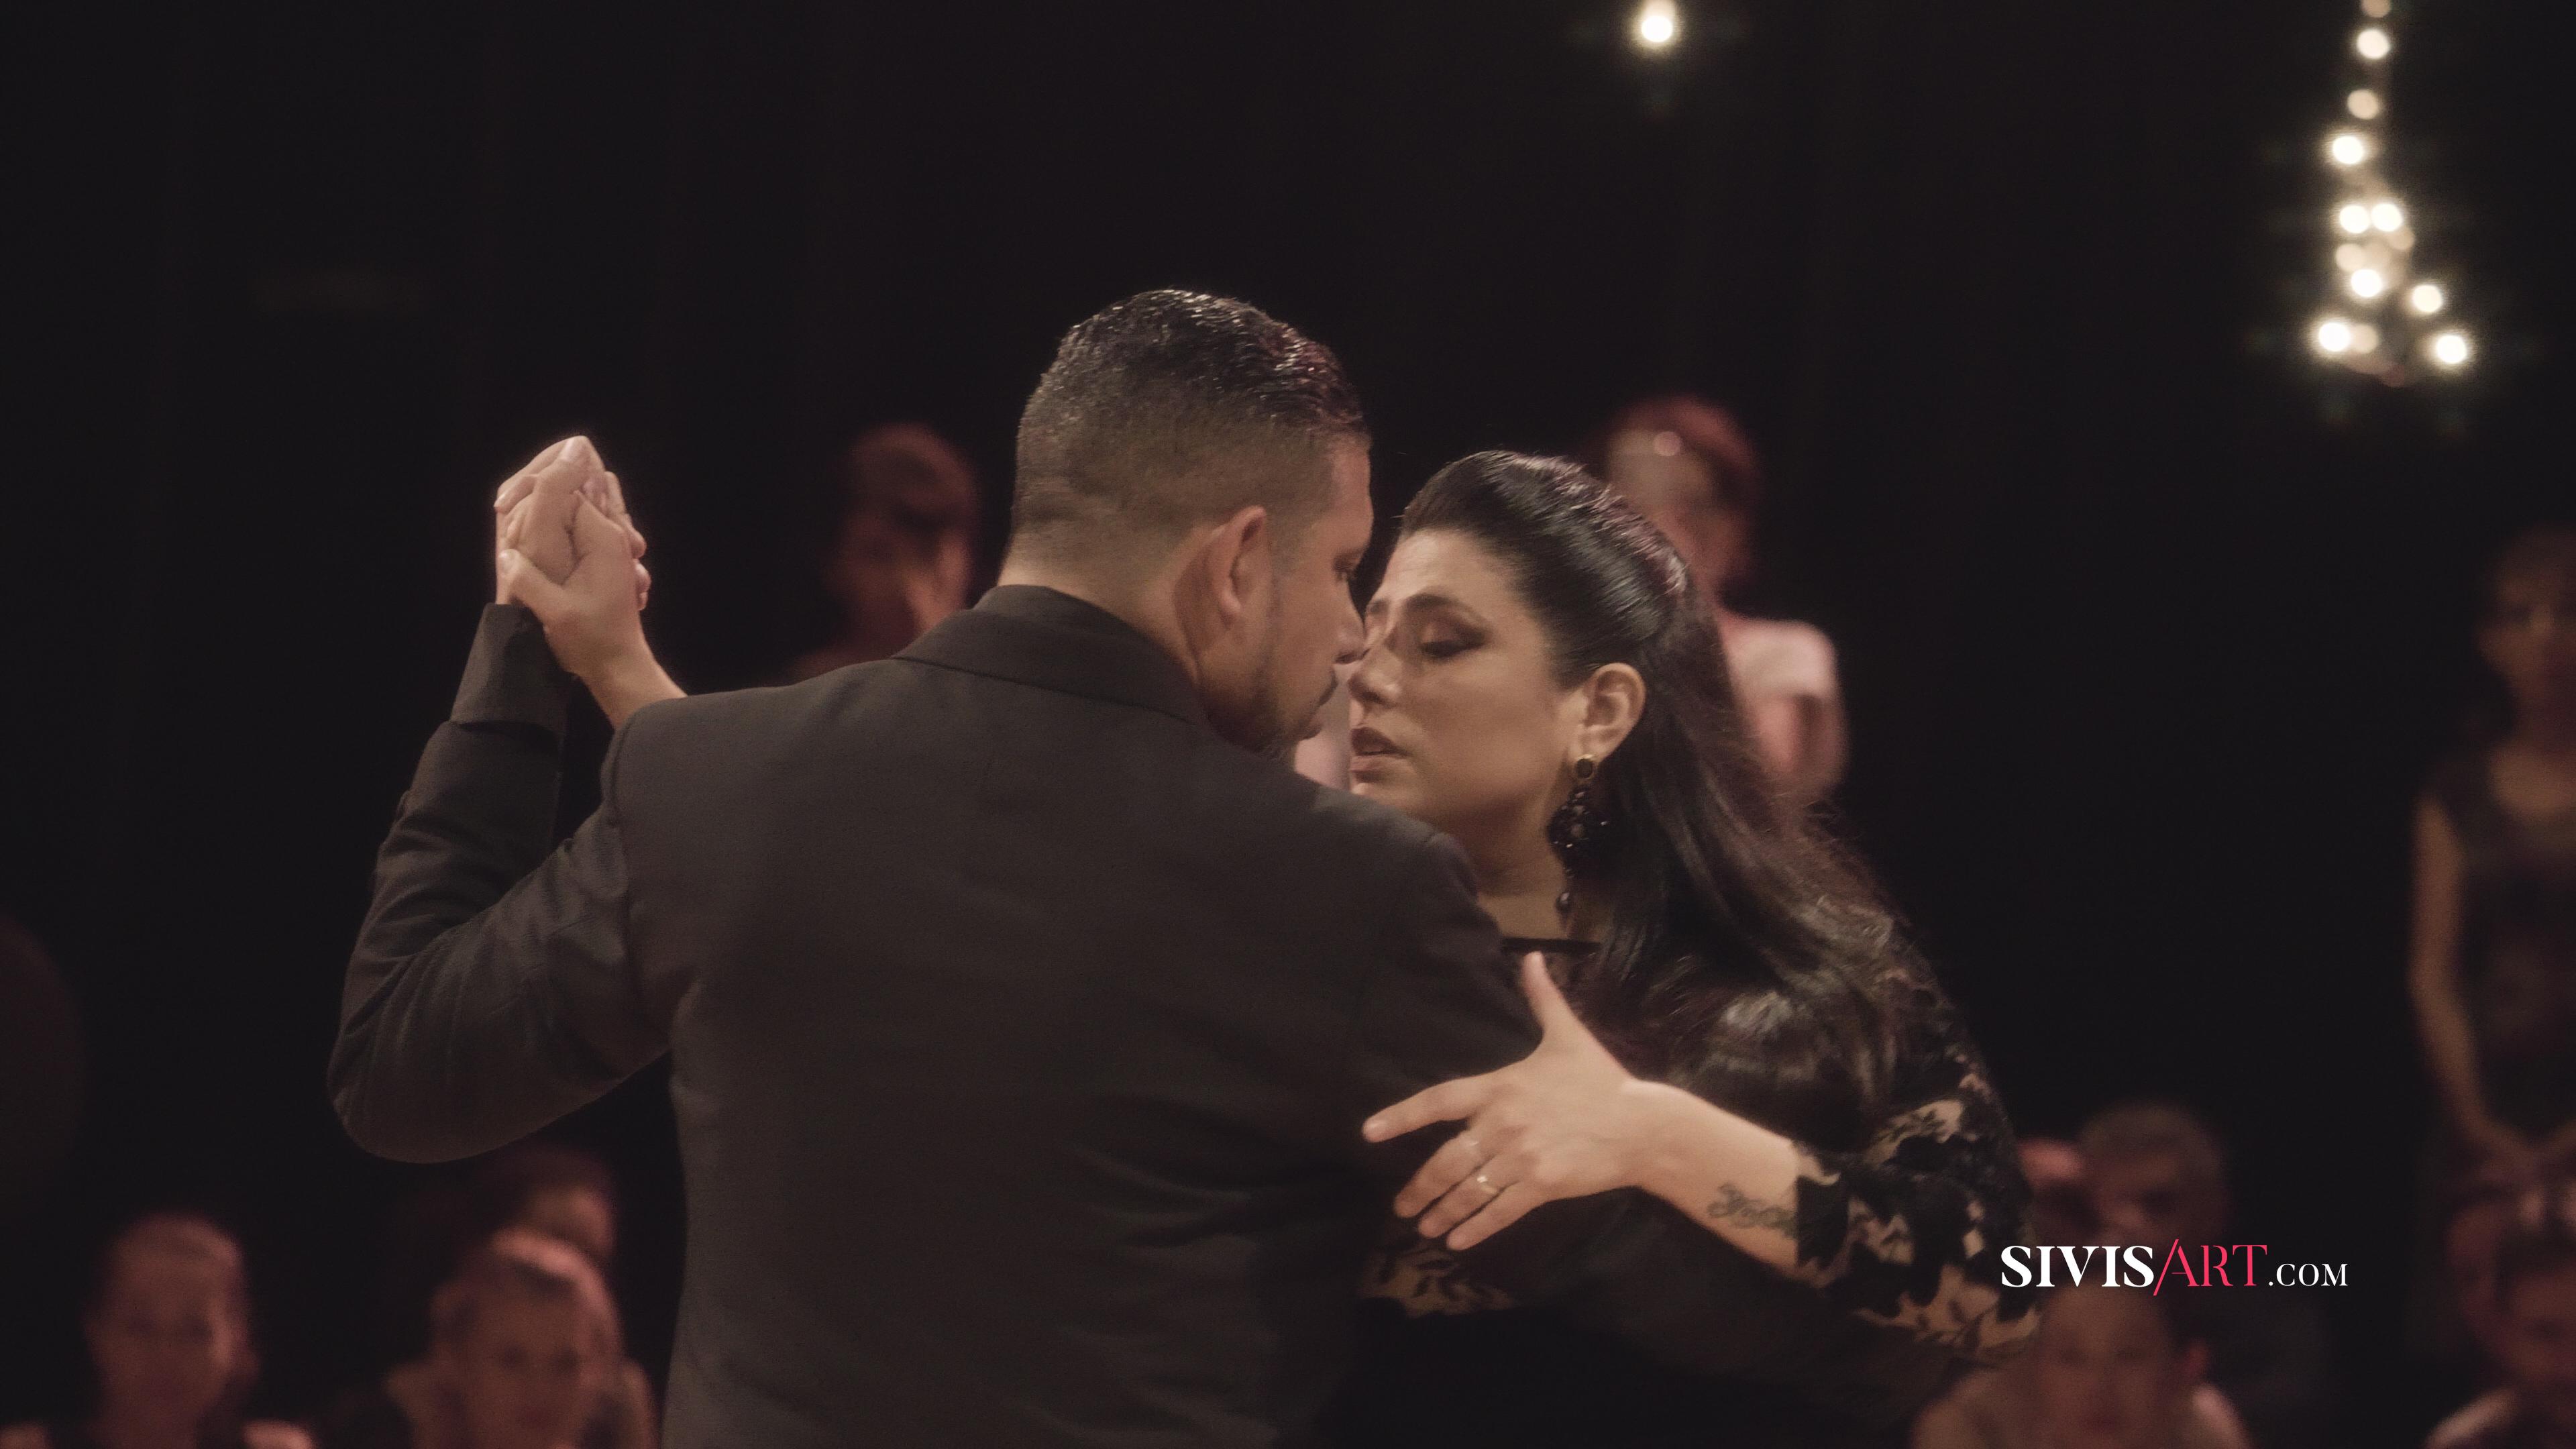 Sivis'art Videomaker presents  Maria-Ines Bogado & Roberto Zuccarino